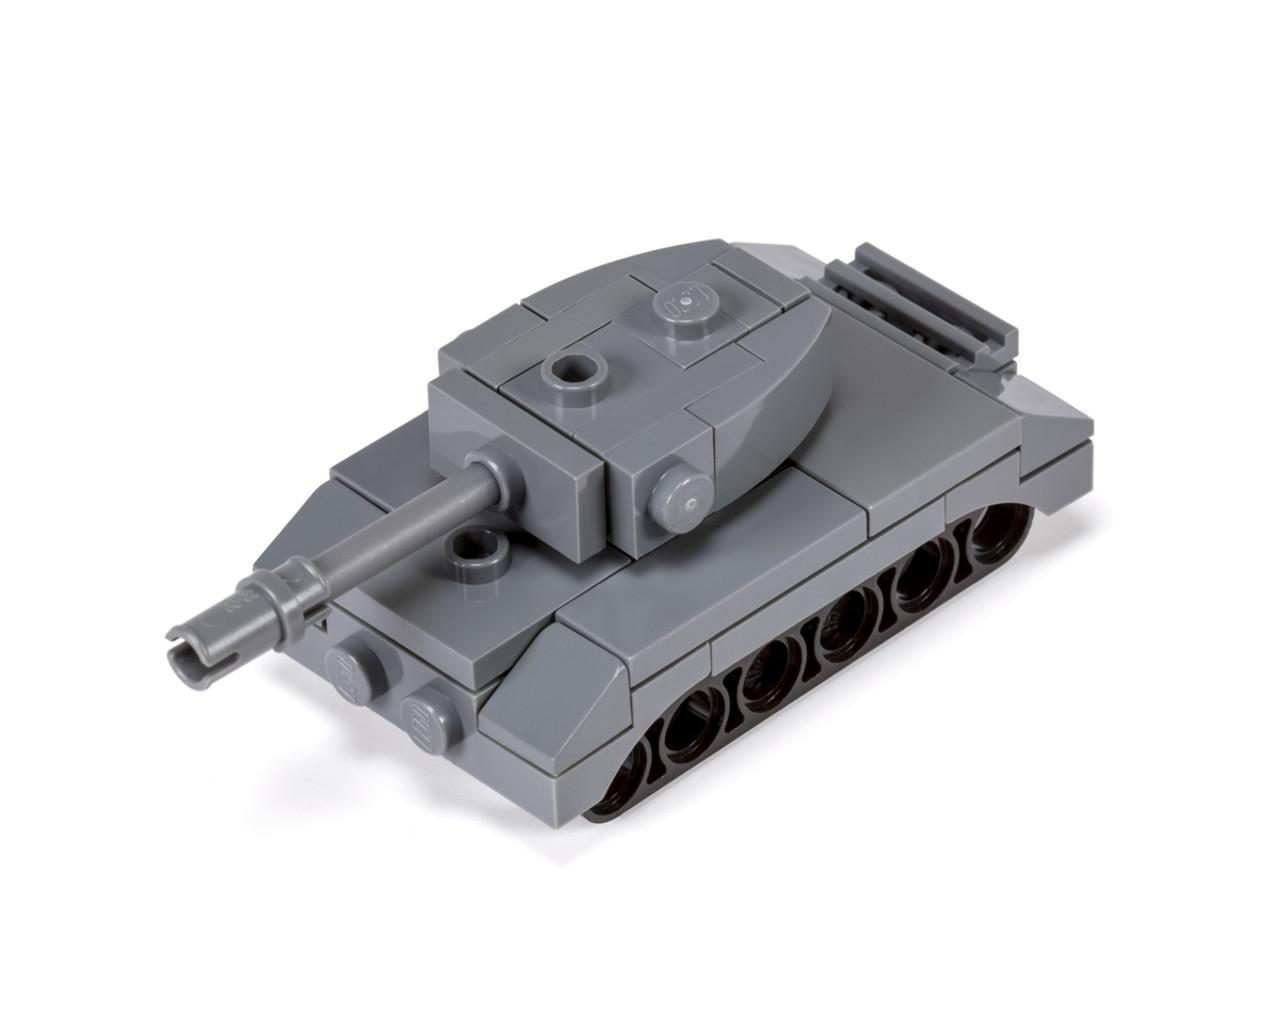 Micro Brick Battle - M26 Pershing